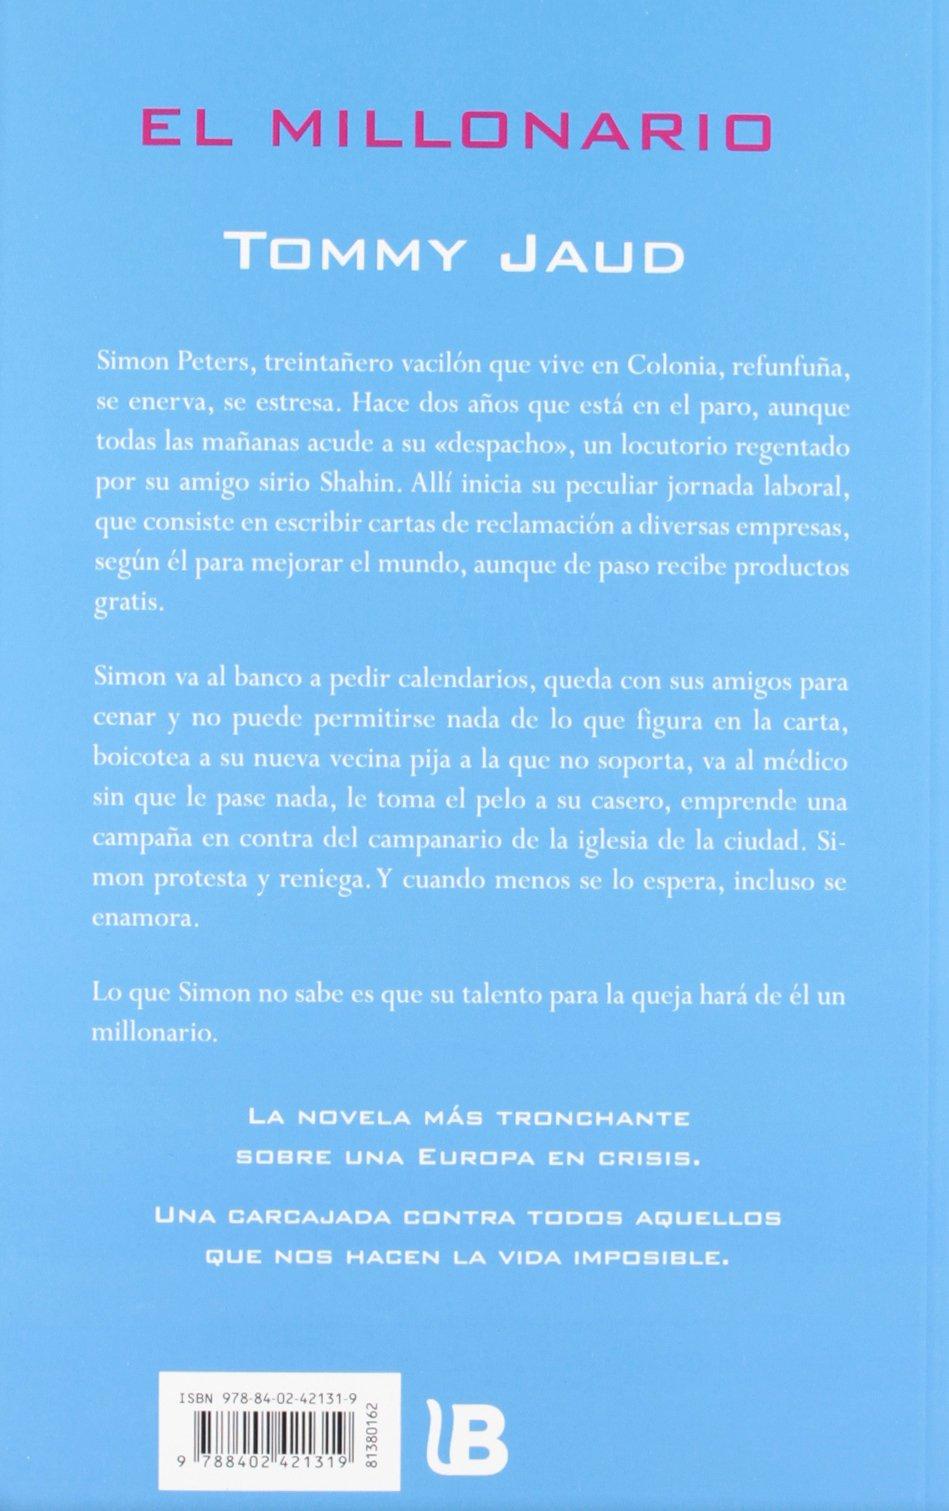 El millonario (Spanish Edition): Tommy Jaud: 9788402421319: Amazon.com: Books